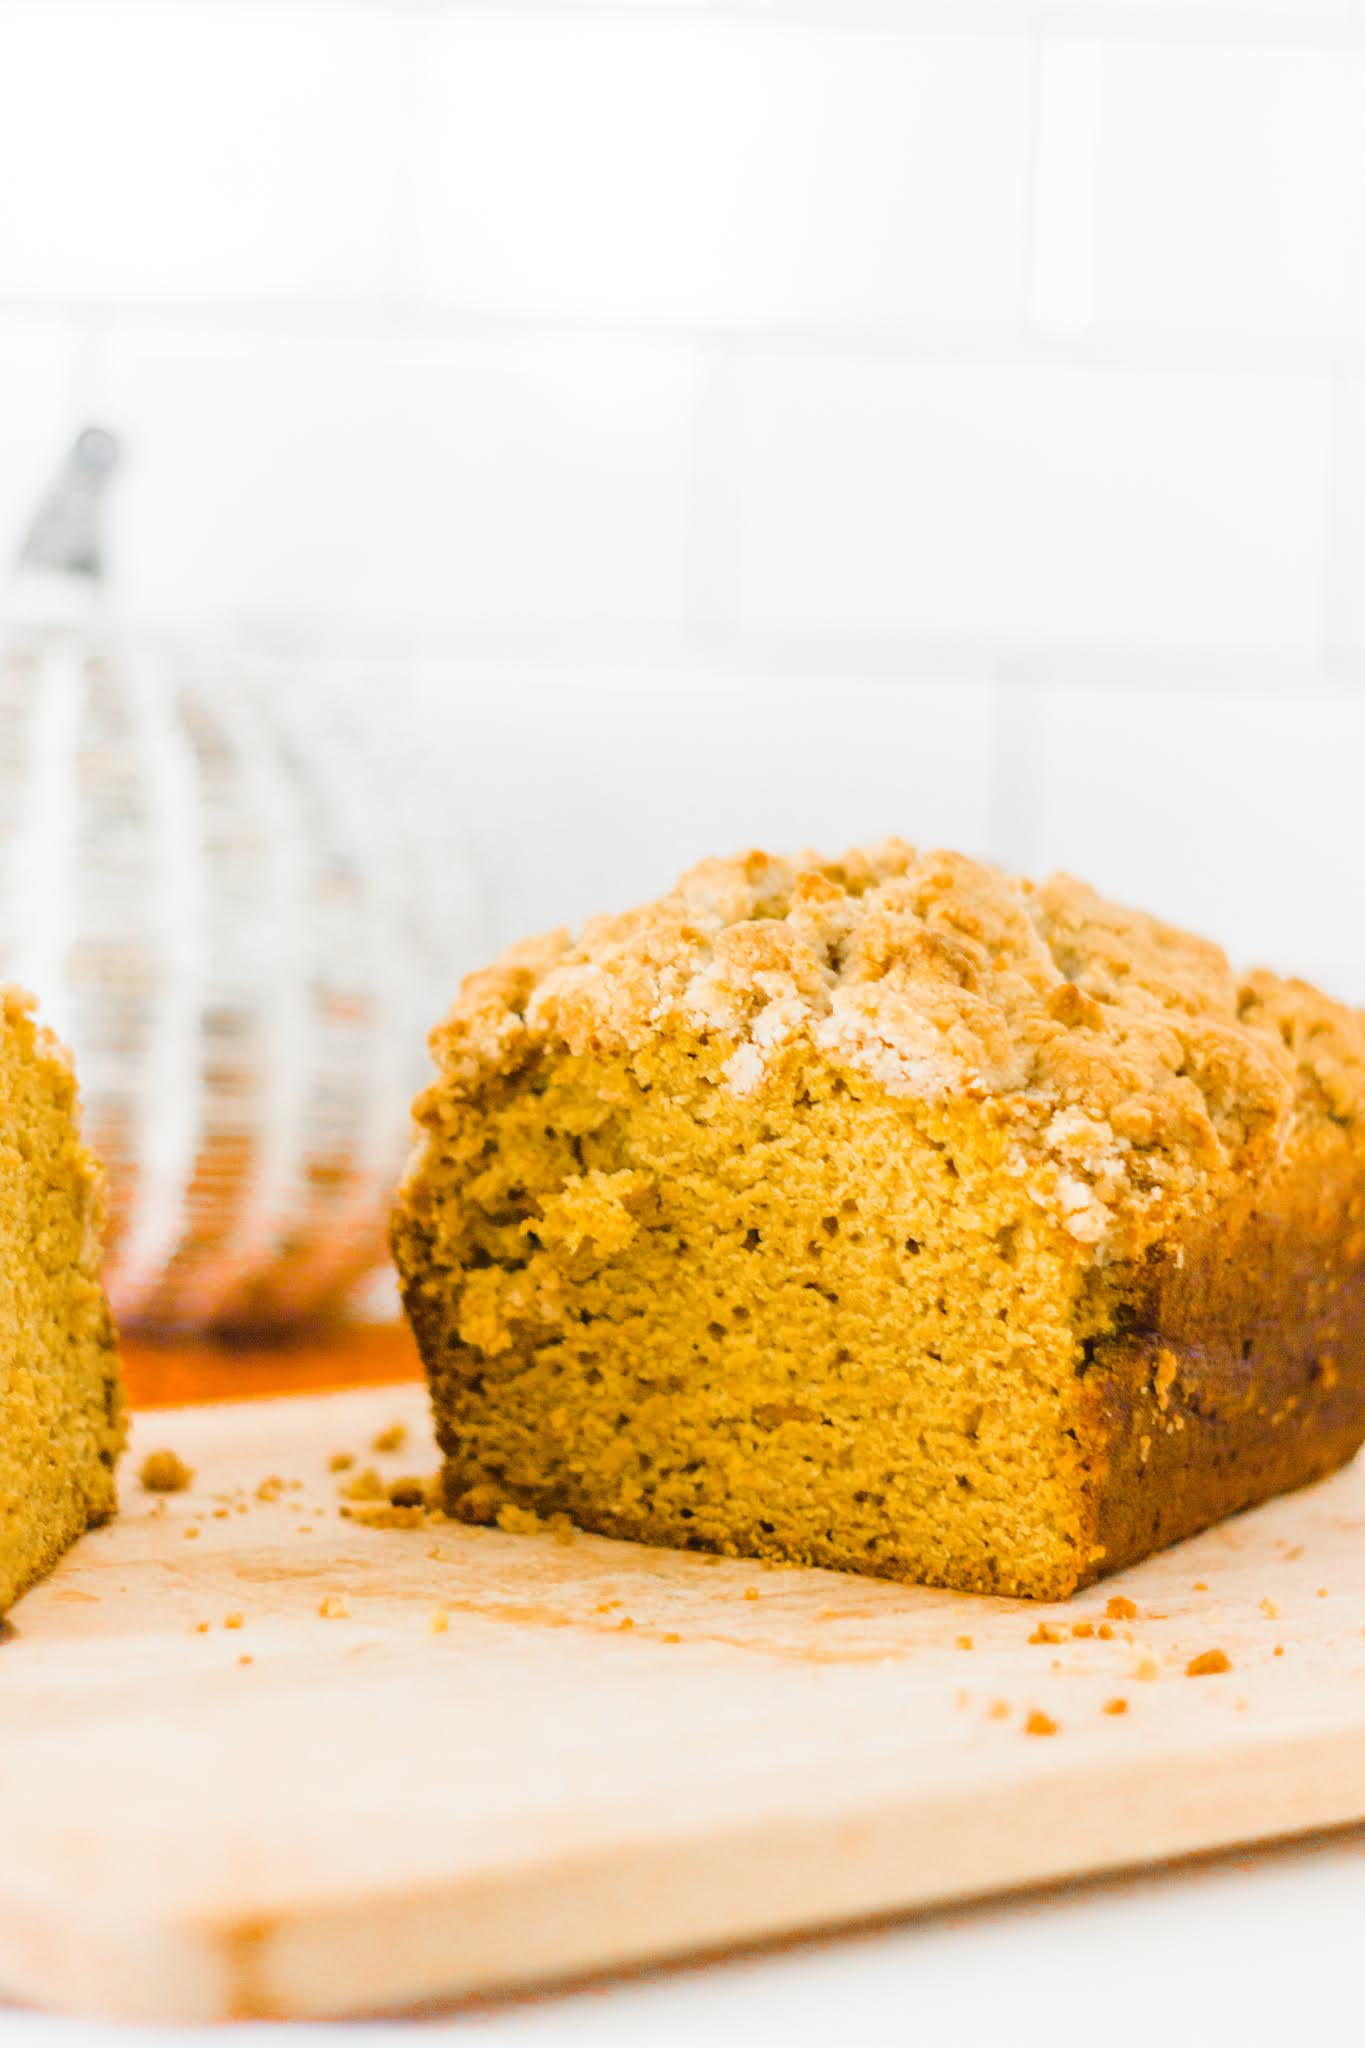 How to Make Buttermilk Pumpkin Bread Without Buttermilk